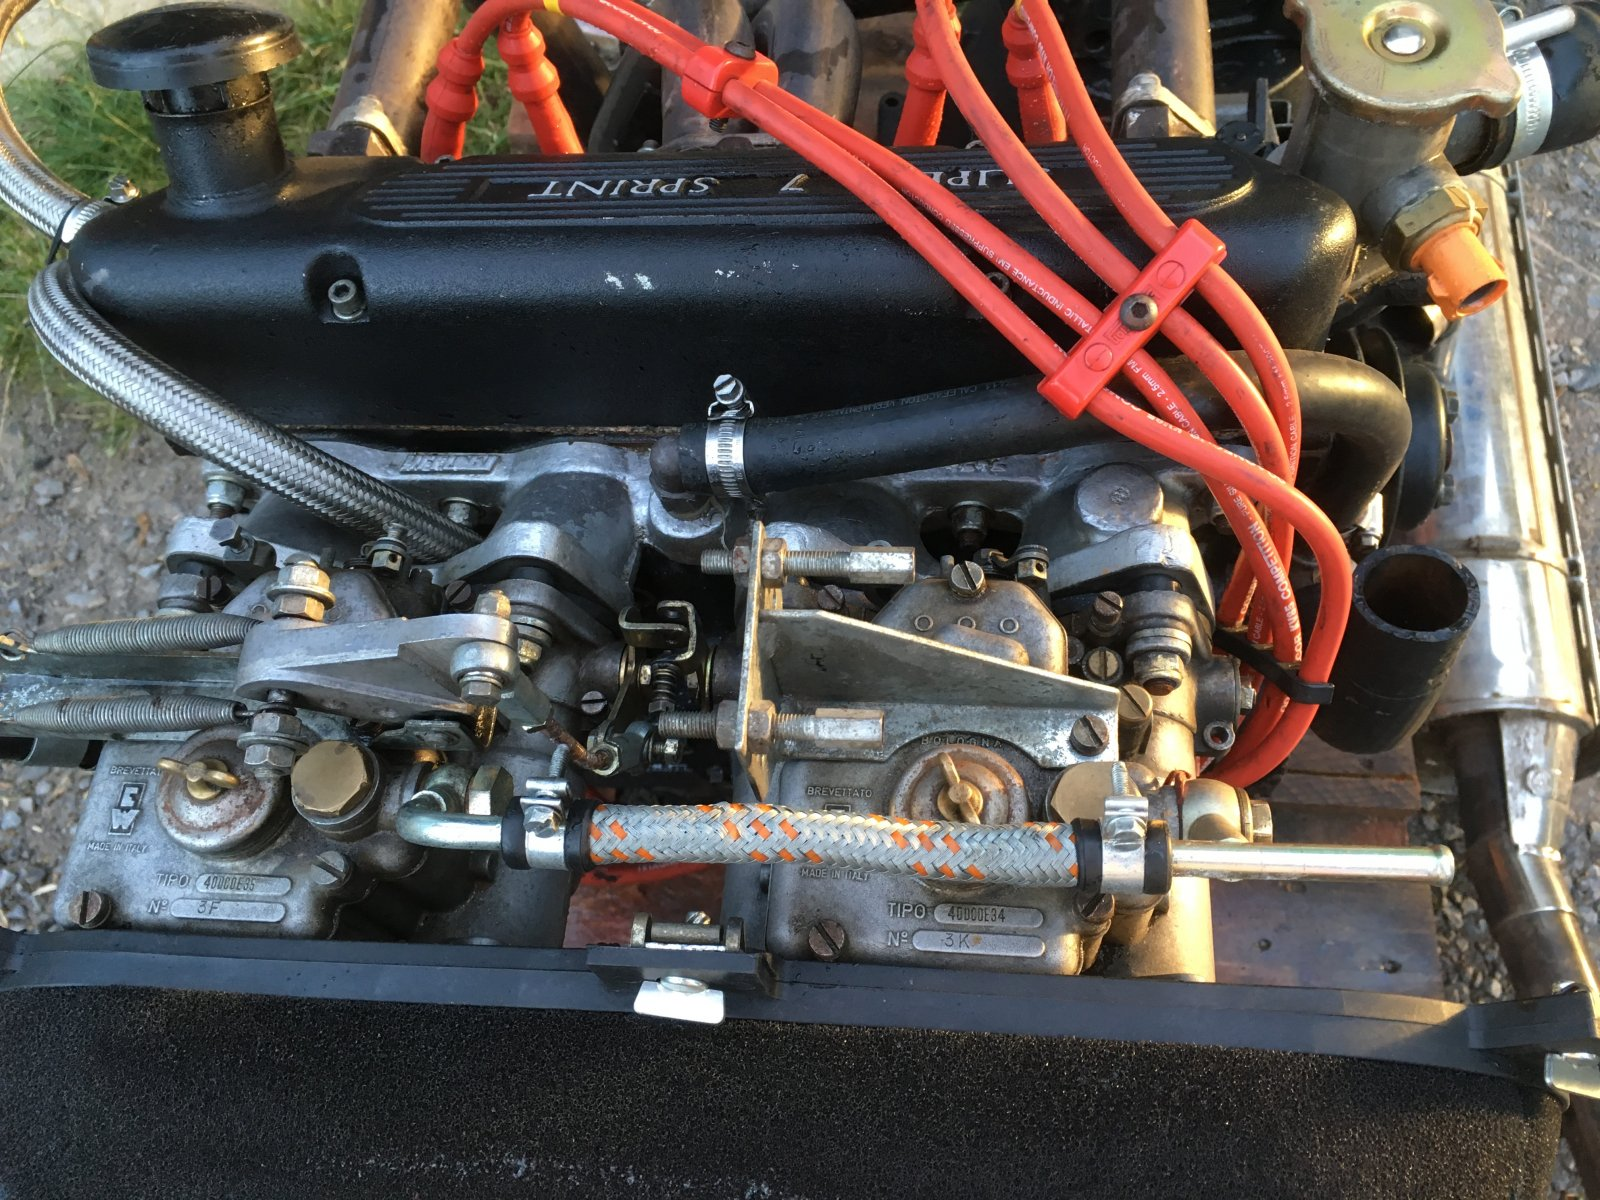 1600 Crossflow Engine For Sale Parts For Sale Wscc